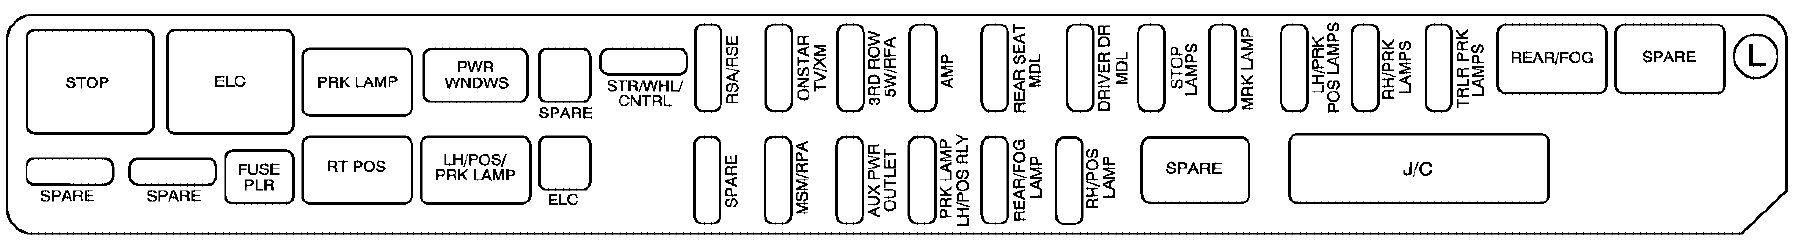 cadillac srx (2009) – fuse box diagram - carknowledge.info cadillac srx fuse box  carknowledge.info